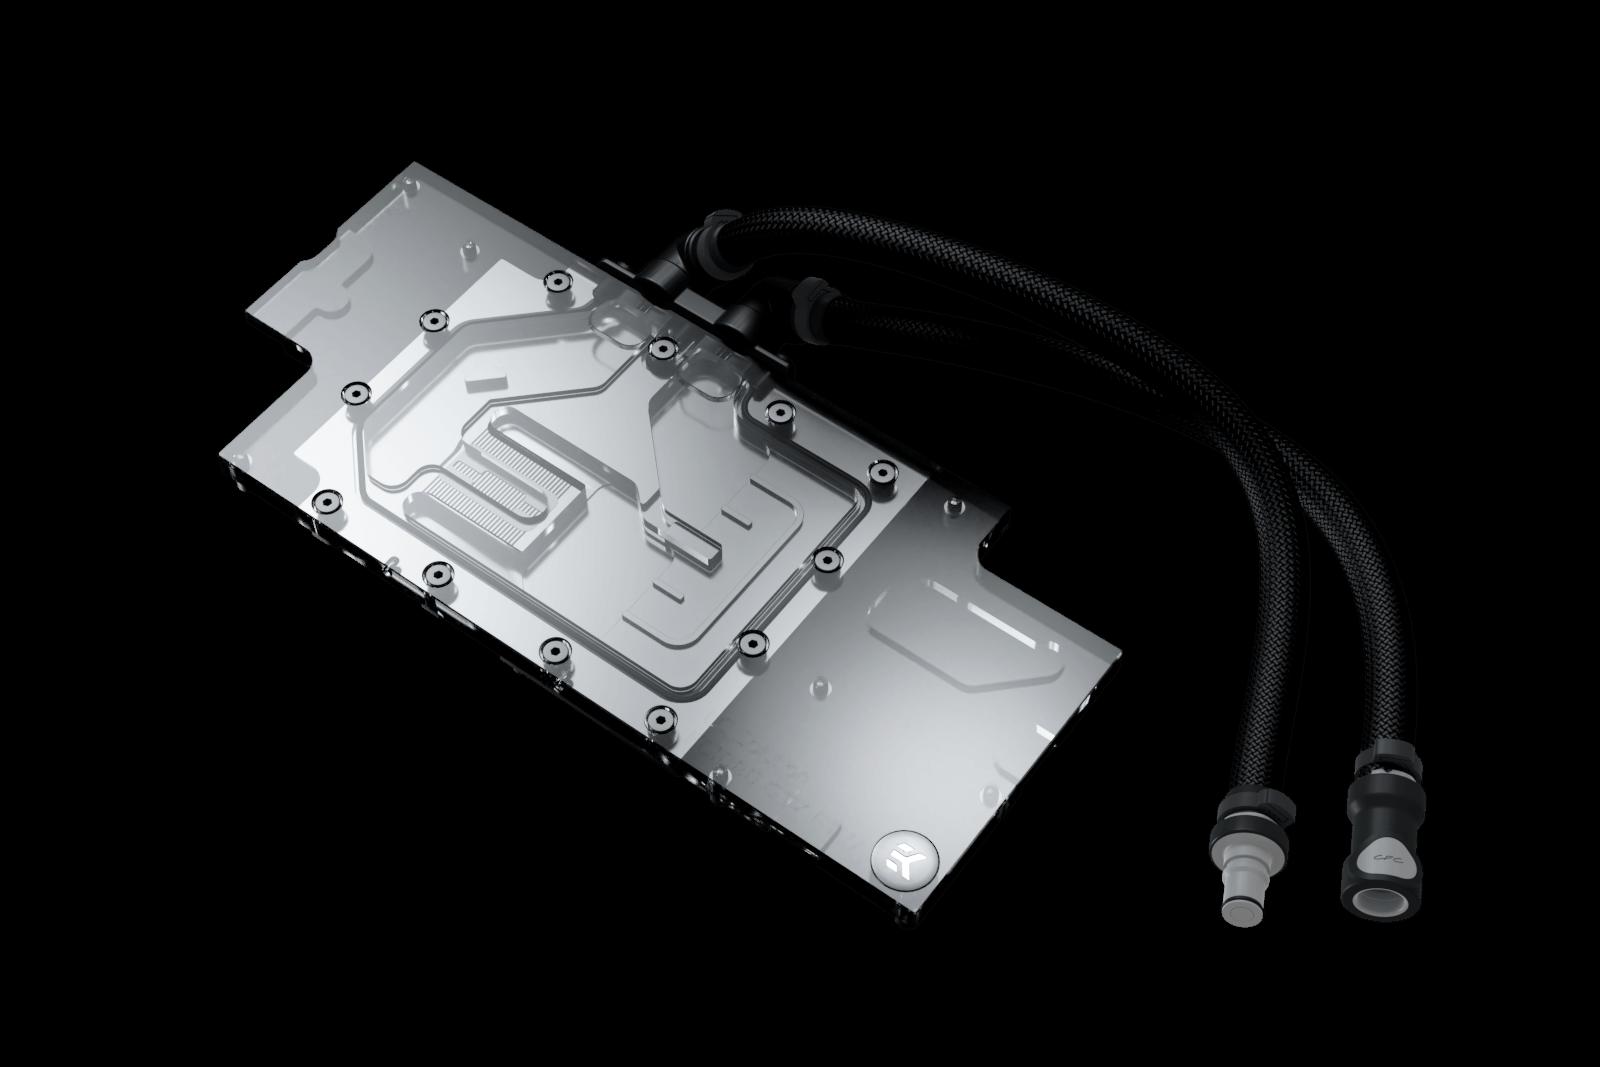 EKWB Announces EK-MLC Phoenix AIO: Modular and Expandable